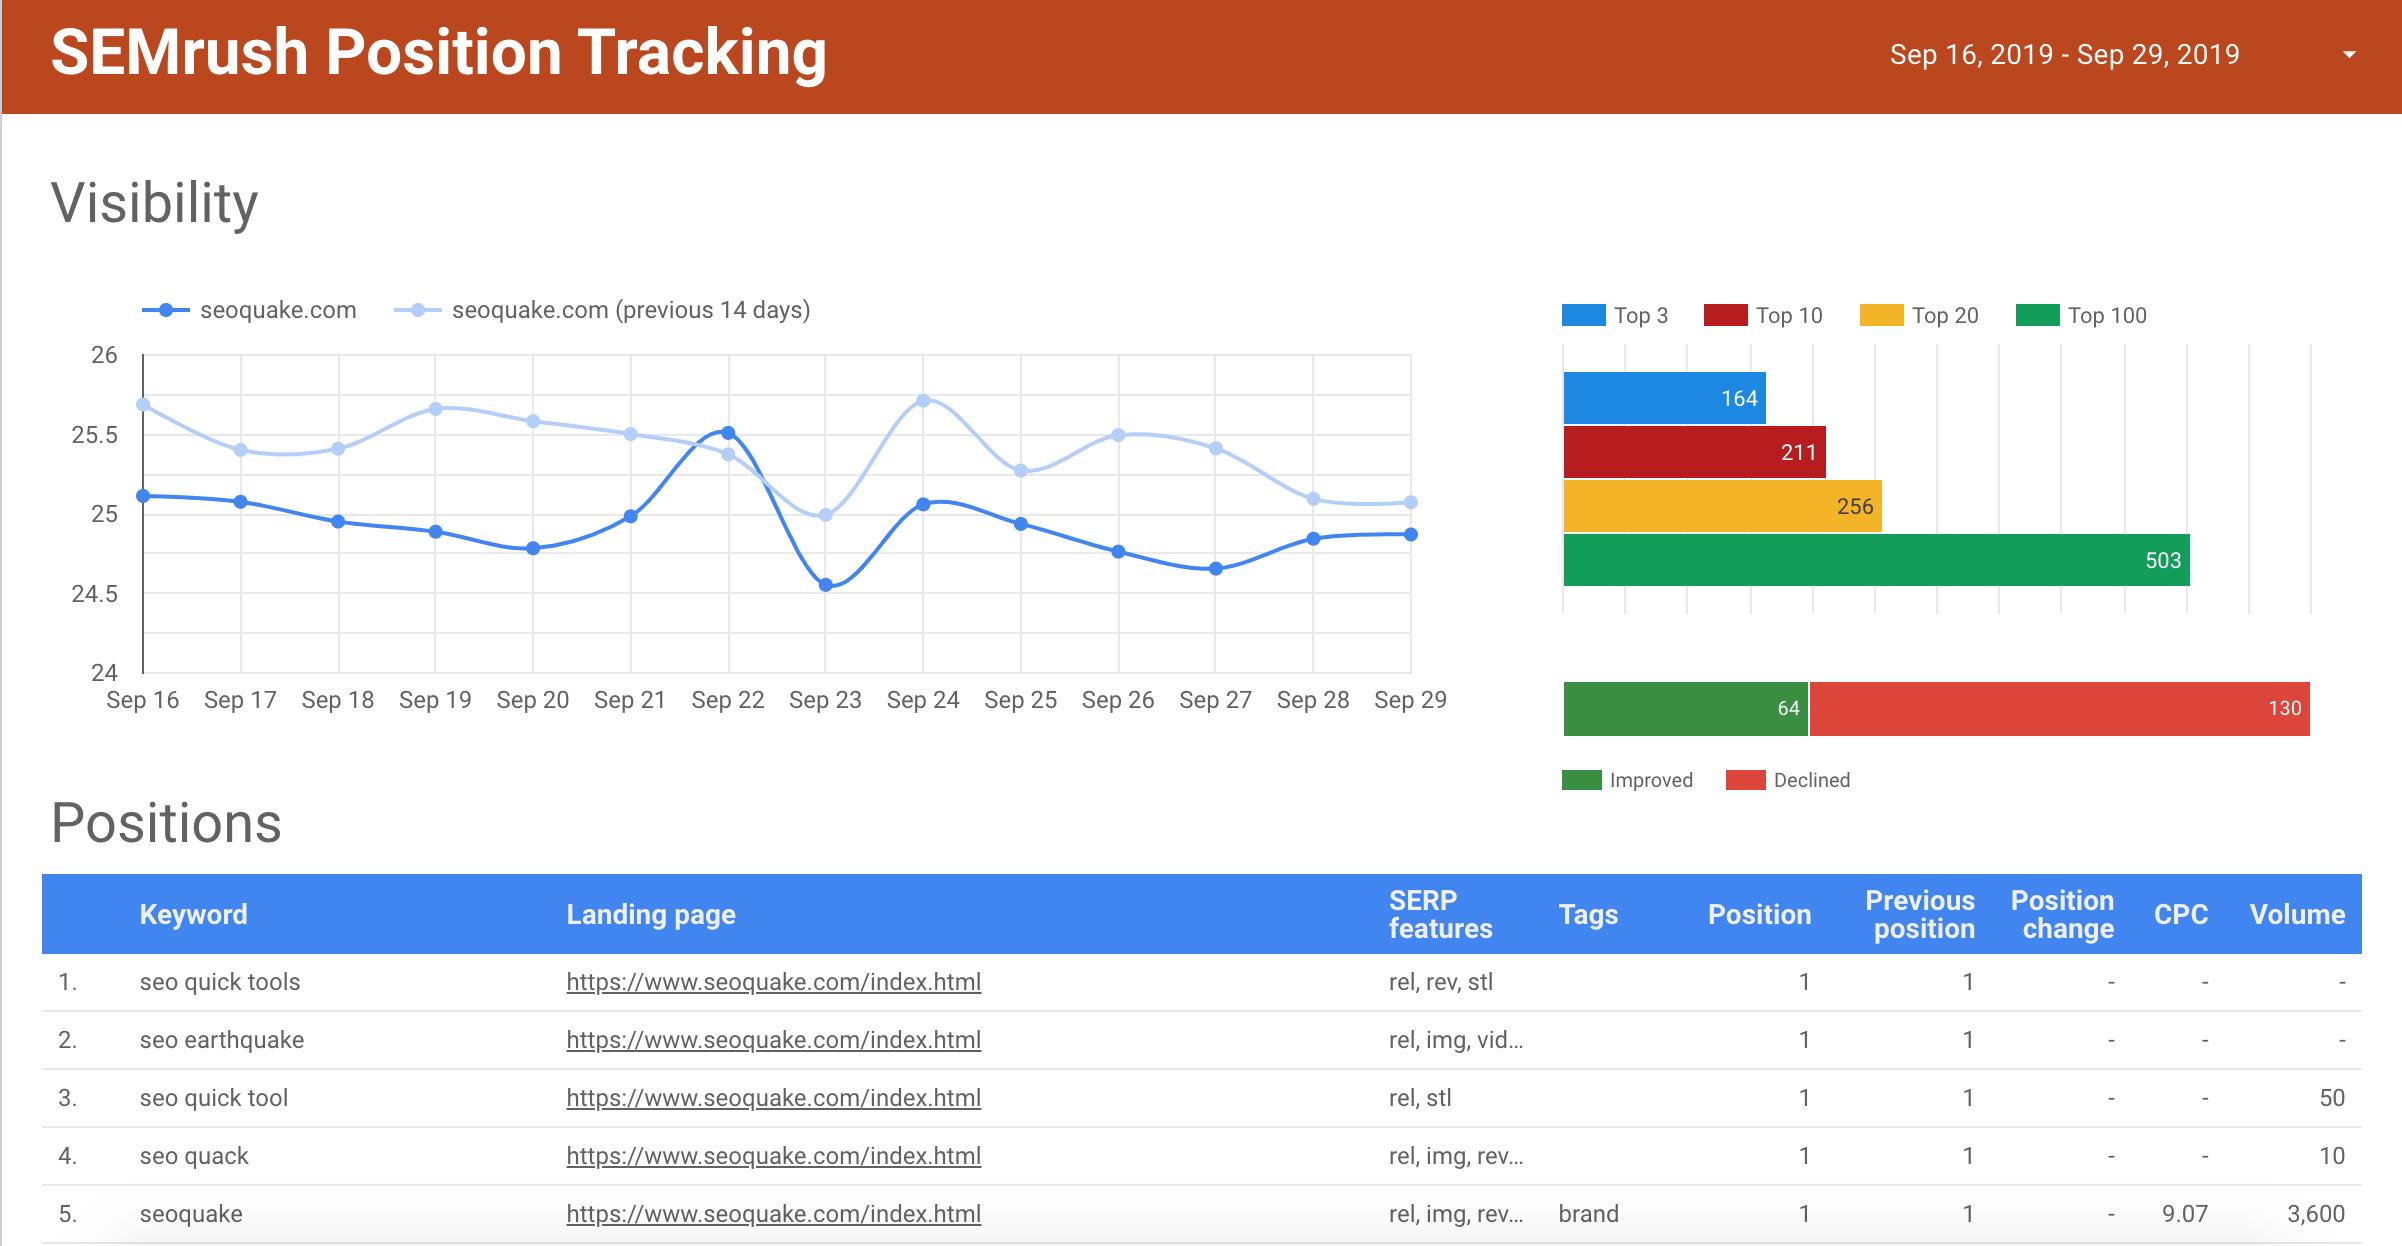 SEMrush Position Tracking data in Google Data Studio